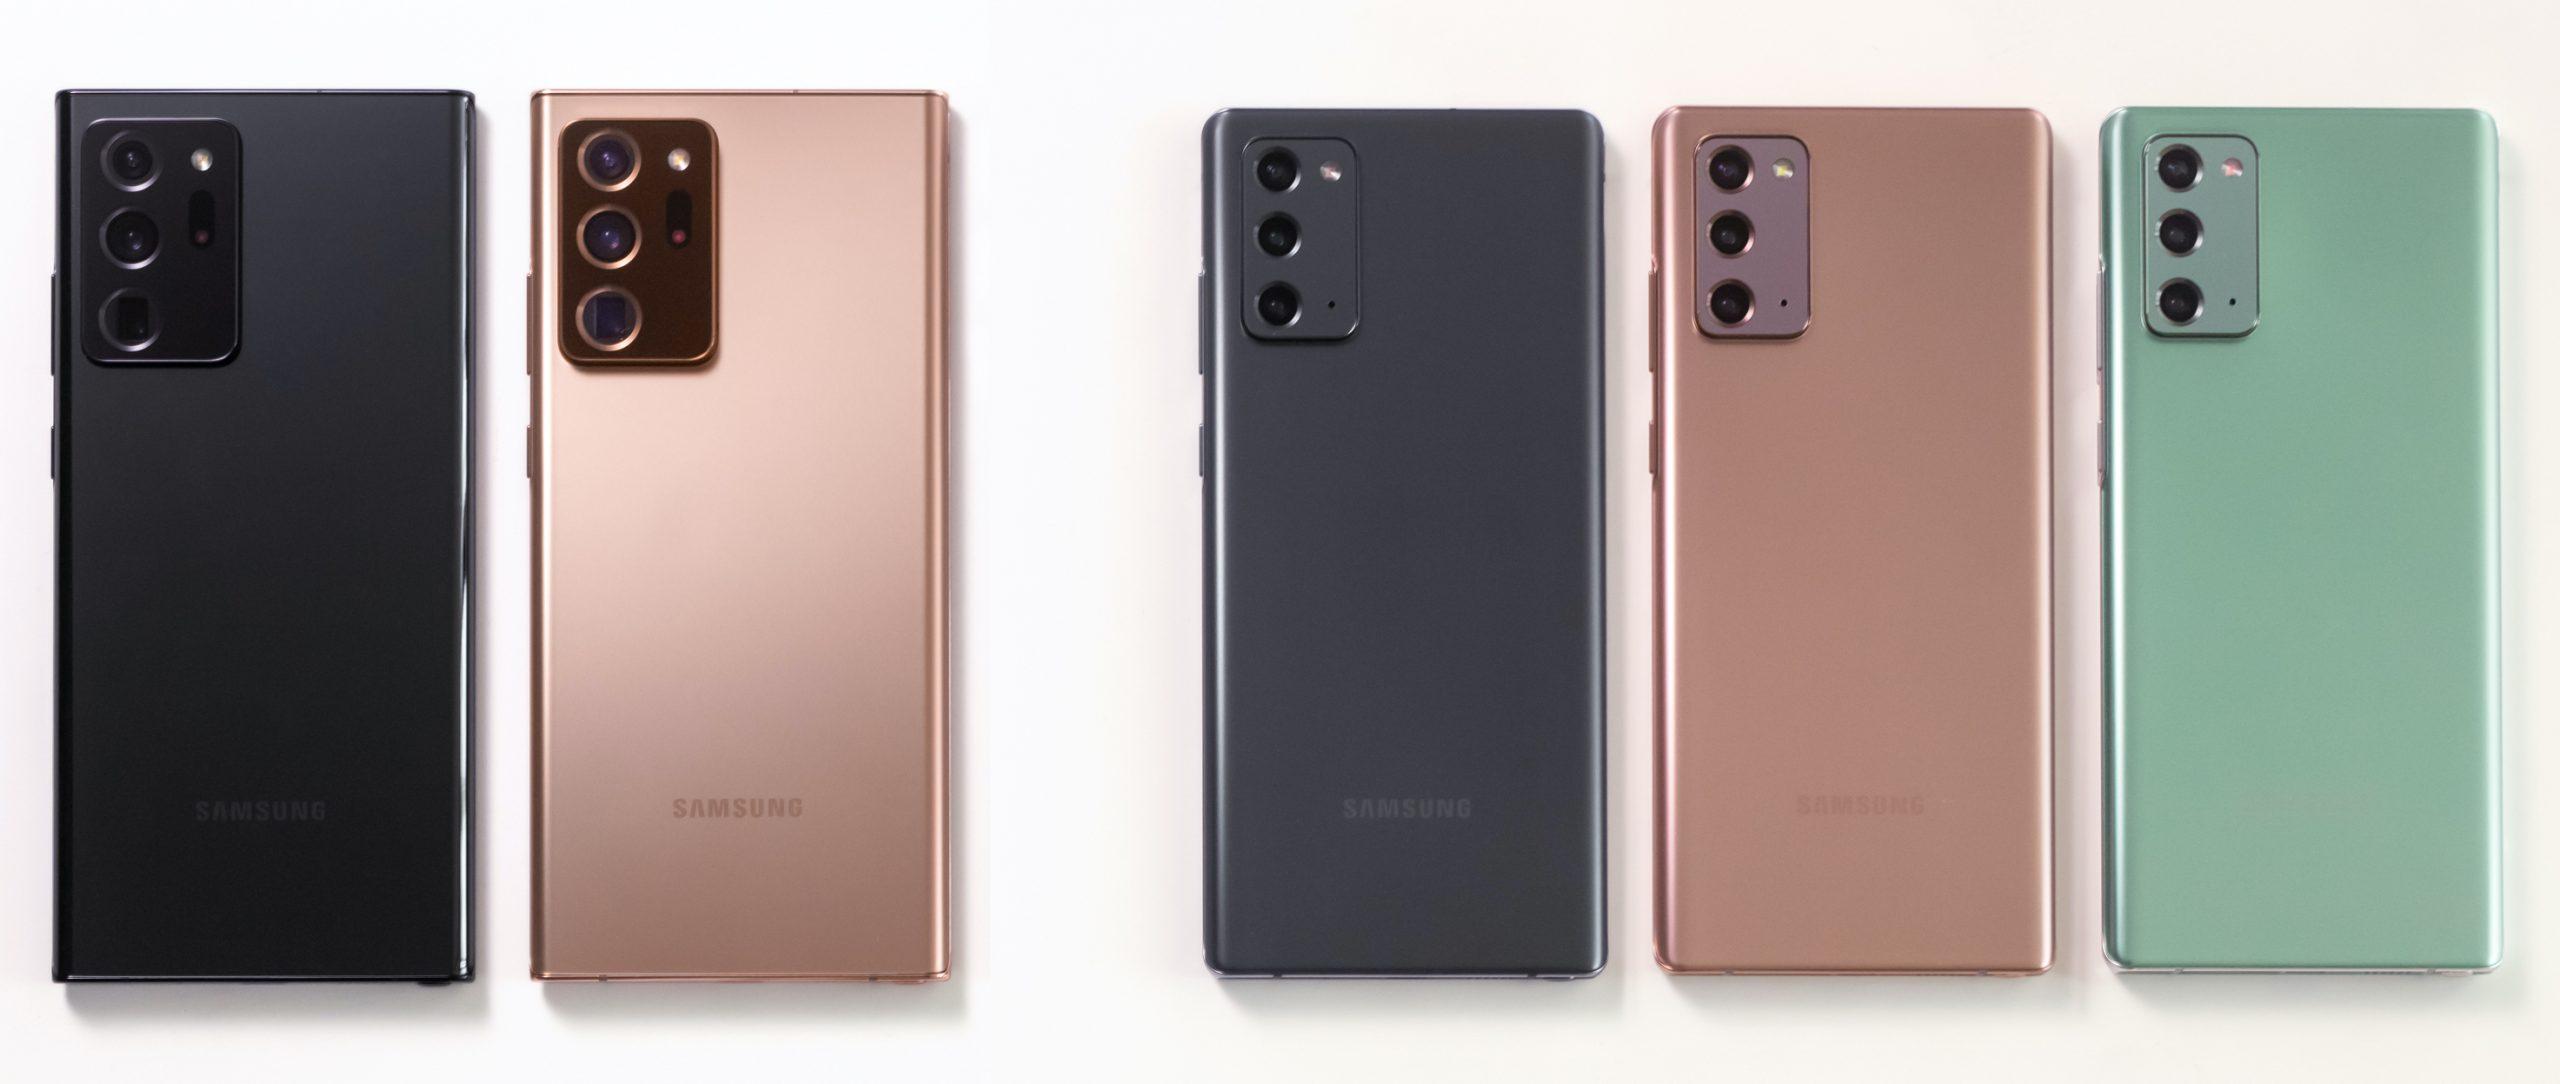 Samsung Galaxy Note20 Ultran ja Galaxy Note20:n värivaihtoehdot Suomessa.